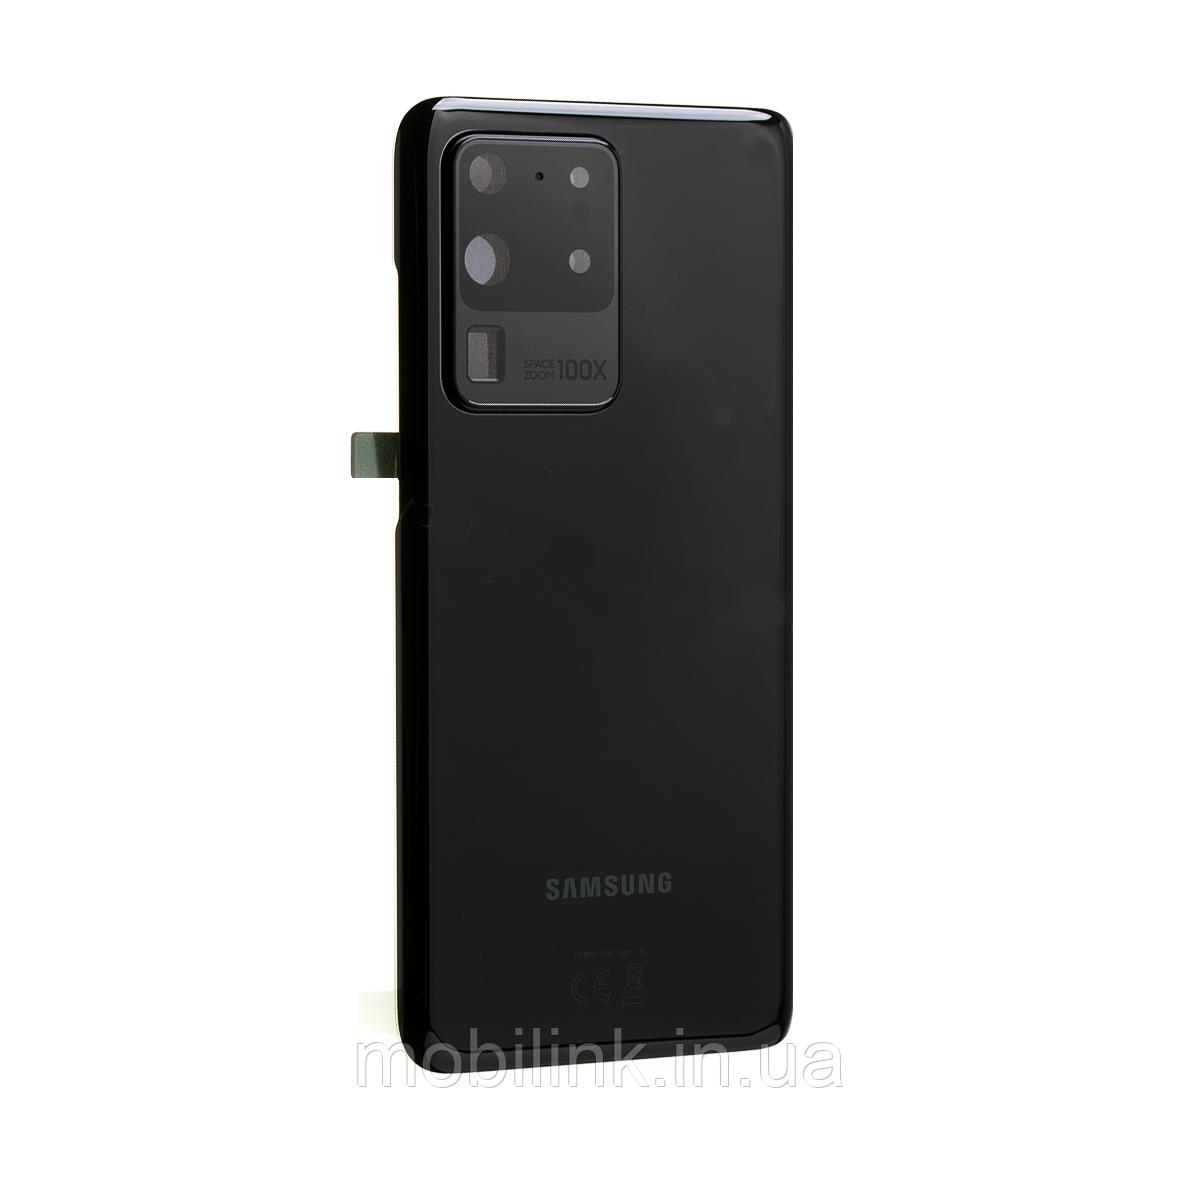 Крышка задняя Samsung SM-G988 Galaxy S20 Ultra,Чёрная(Cosmic Black), GH82-22262A, оригинал!